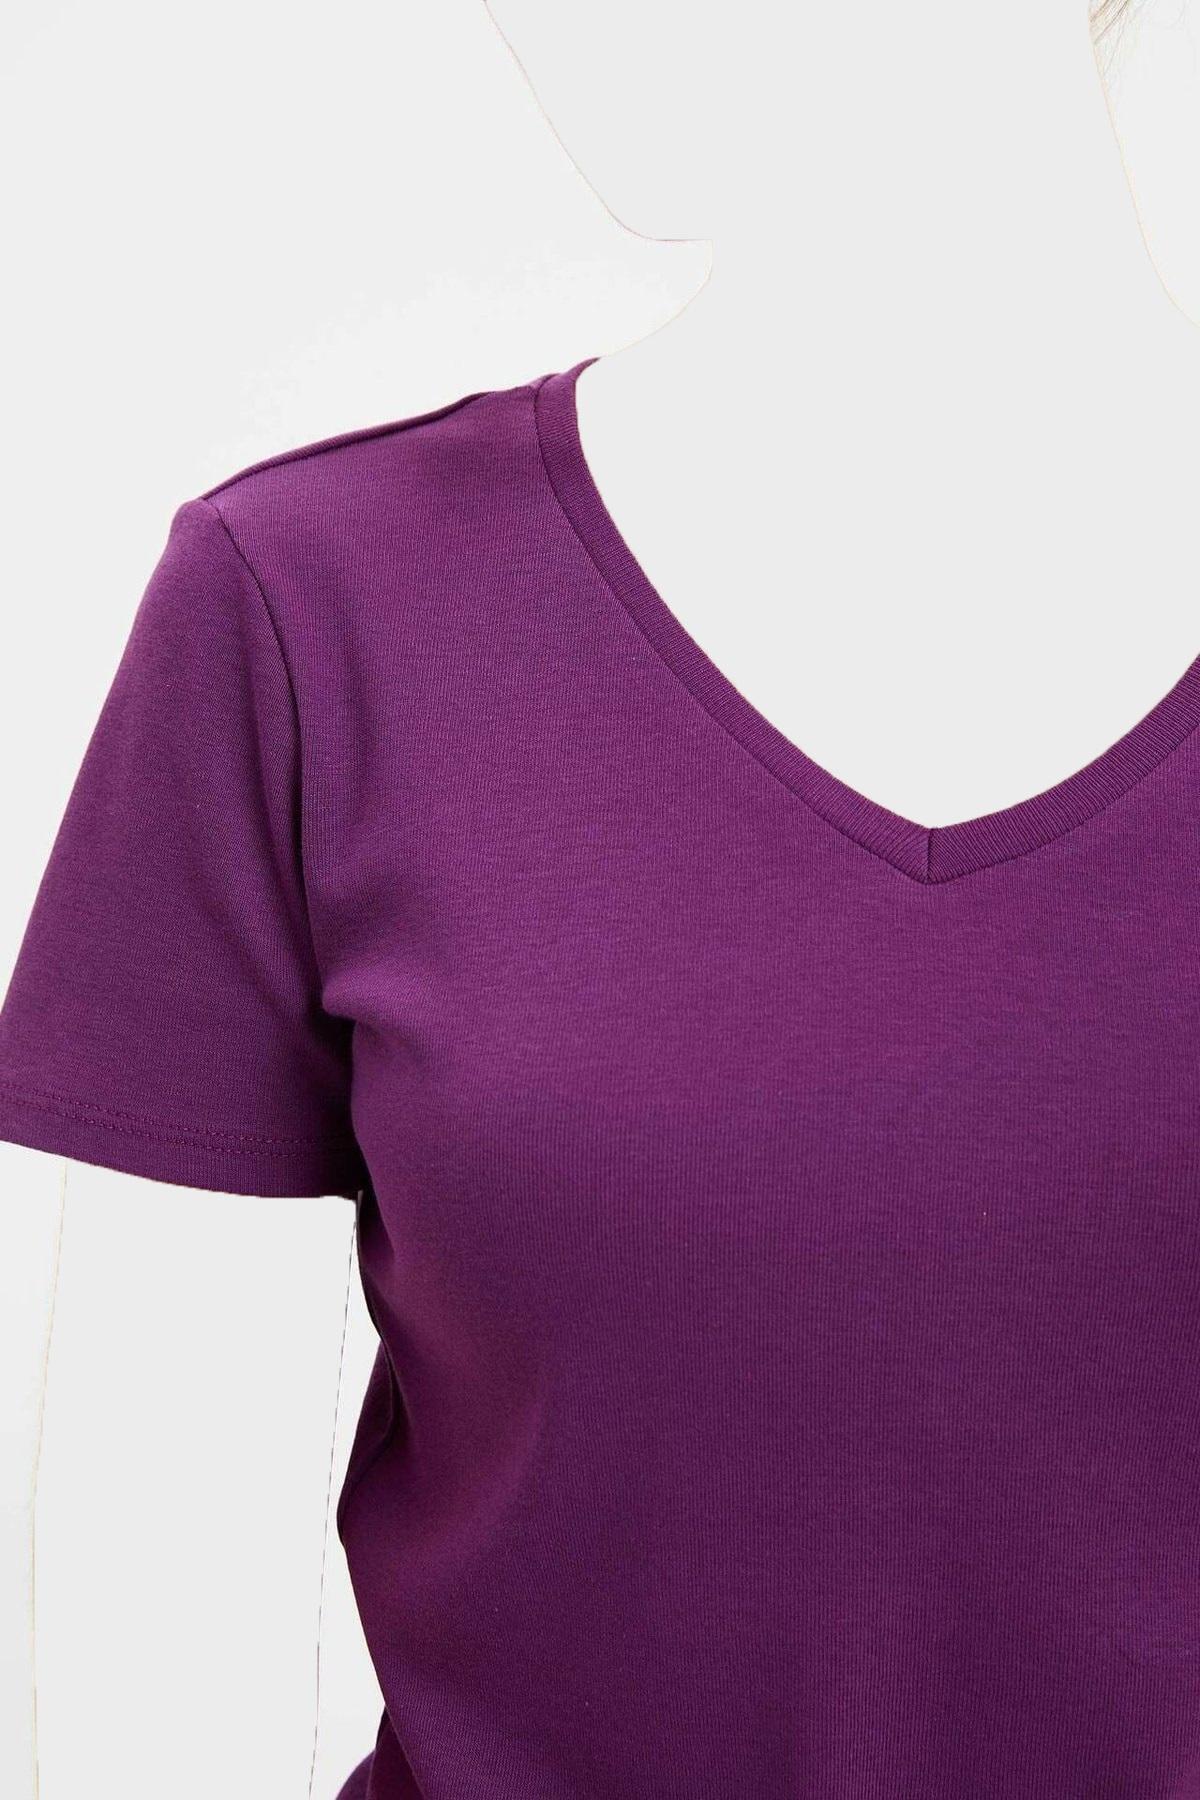 تیشرت زنانه شیک برند دفاکتو رنگ بنفش کد ty35431642